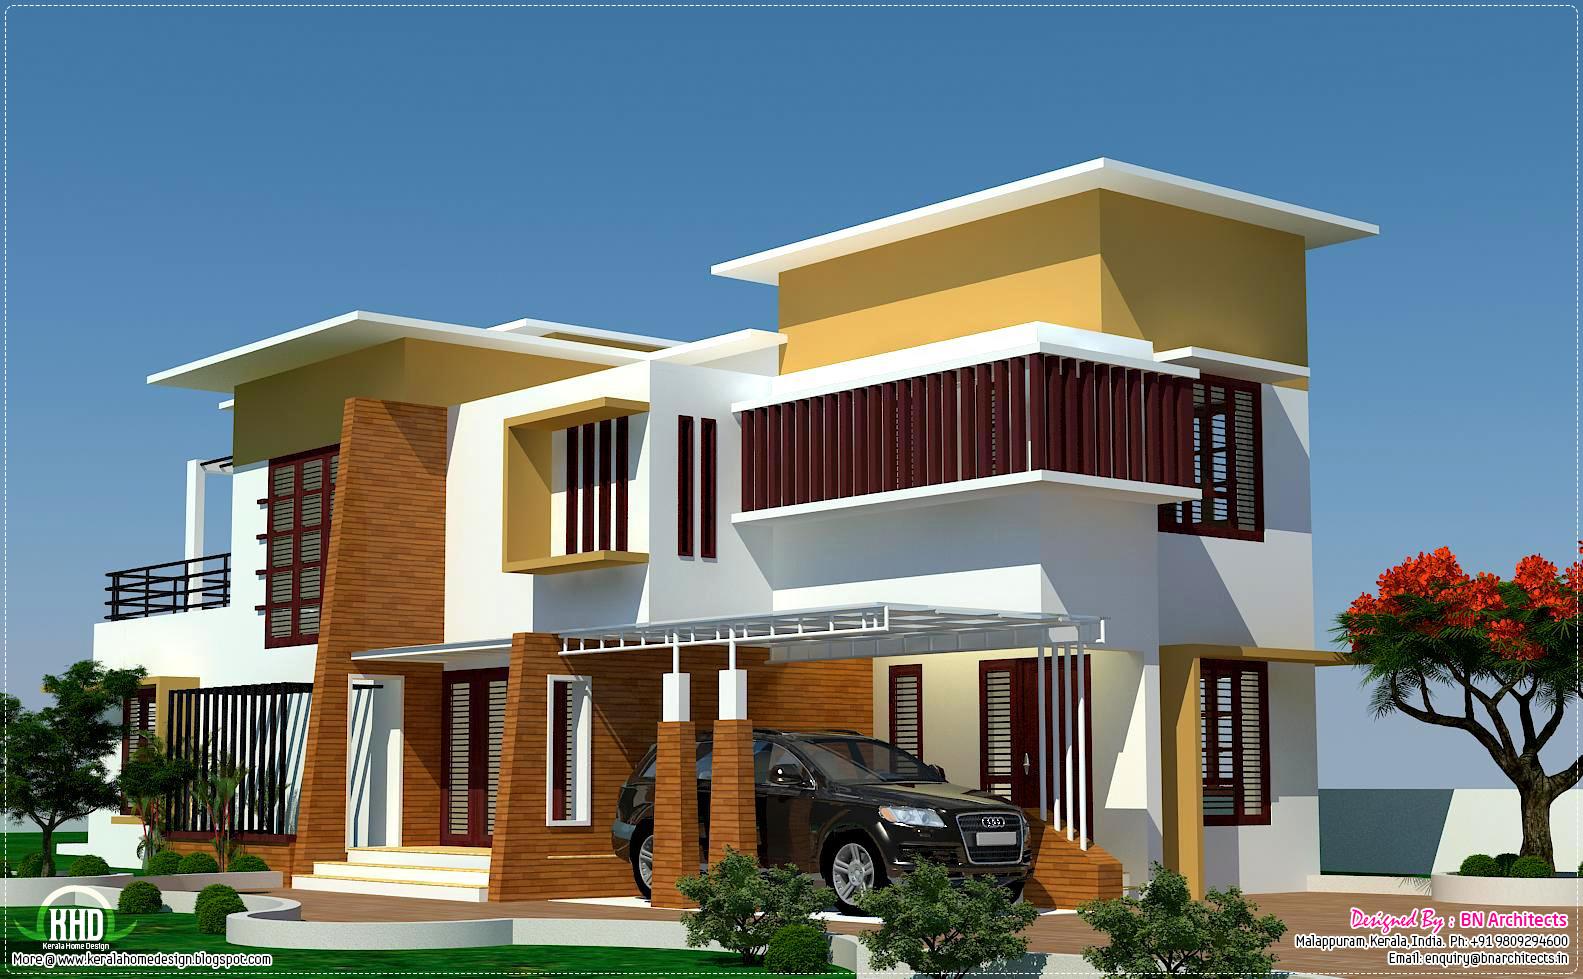 4 Bedroom Modern Villa Design Kerala Home Design And